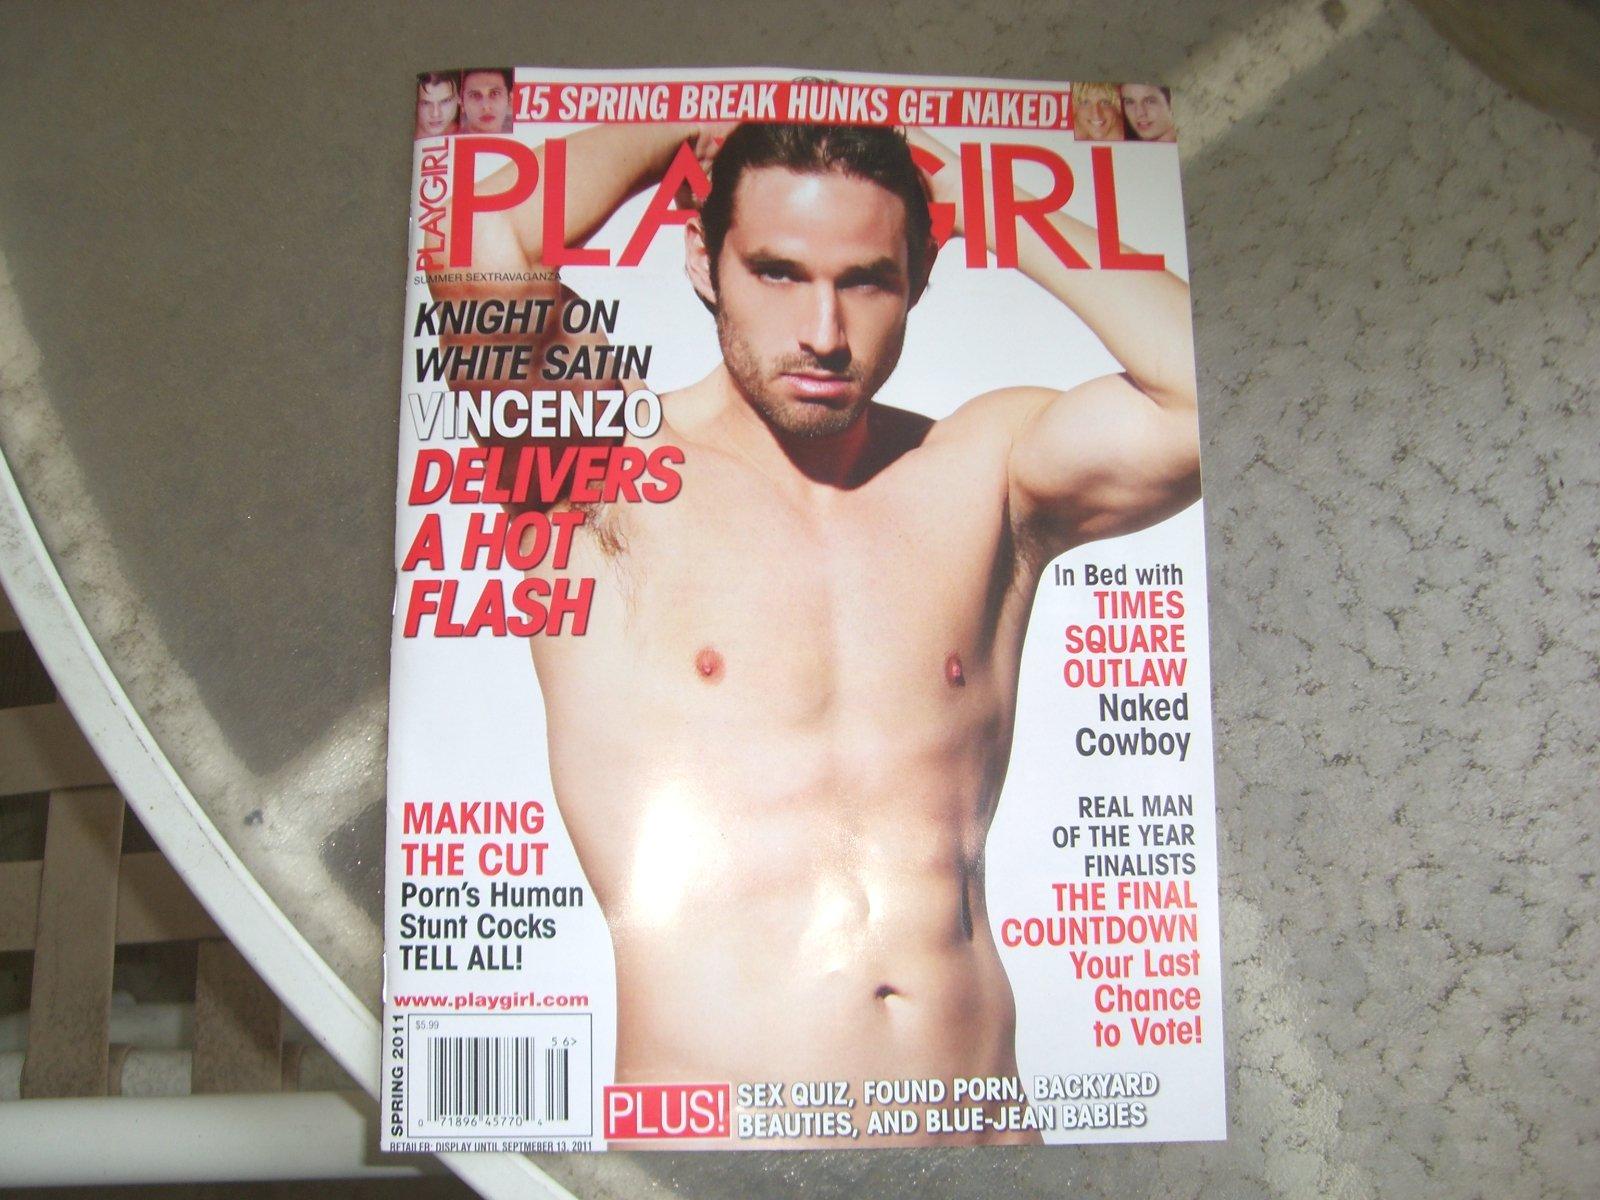 Download PLAYGIRL+SUMMER 2011+COVER MODEL VINCENZO+PLAYGIRL (#56) pdf epub